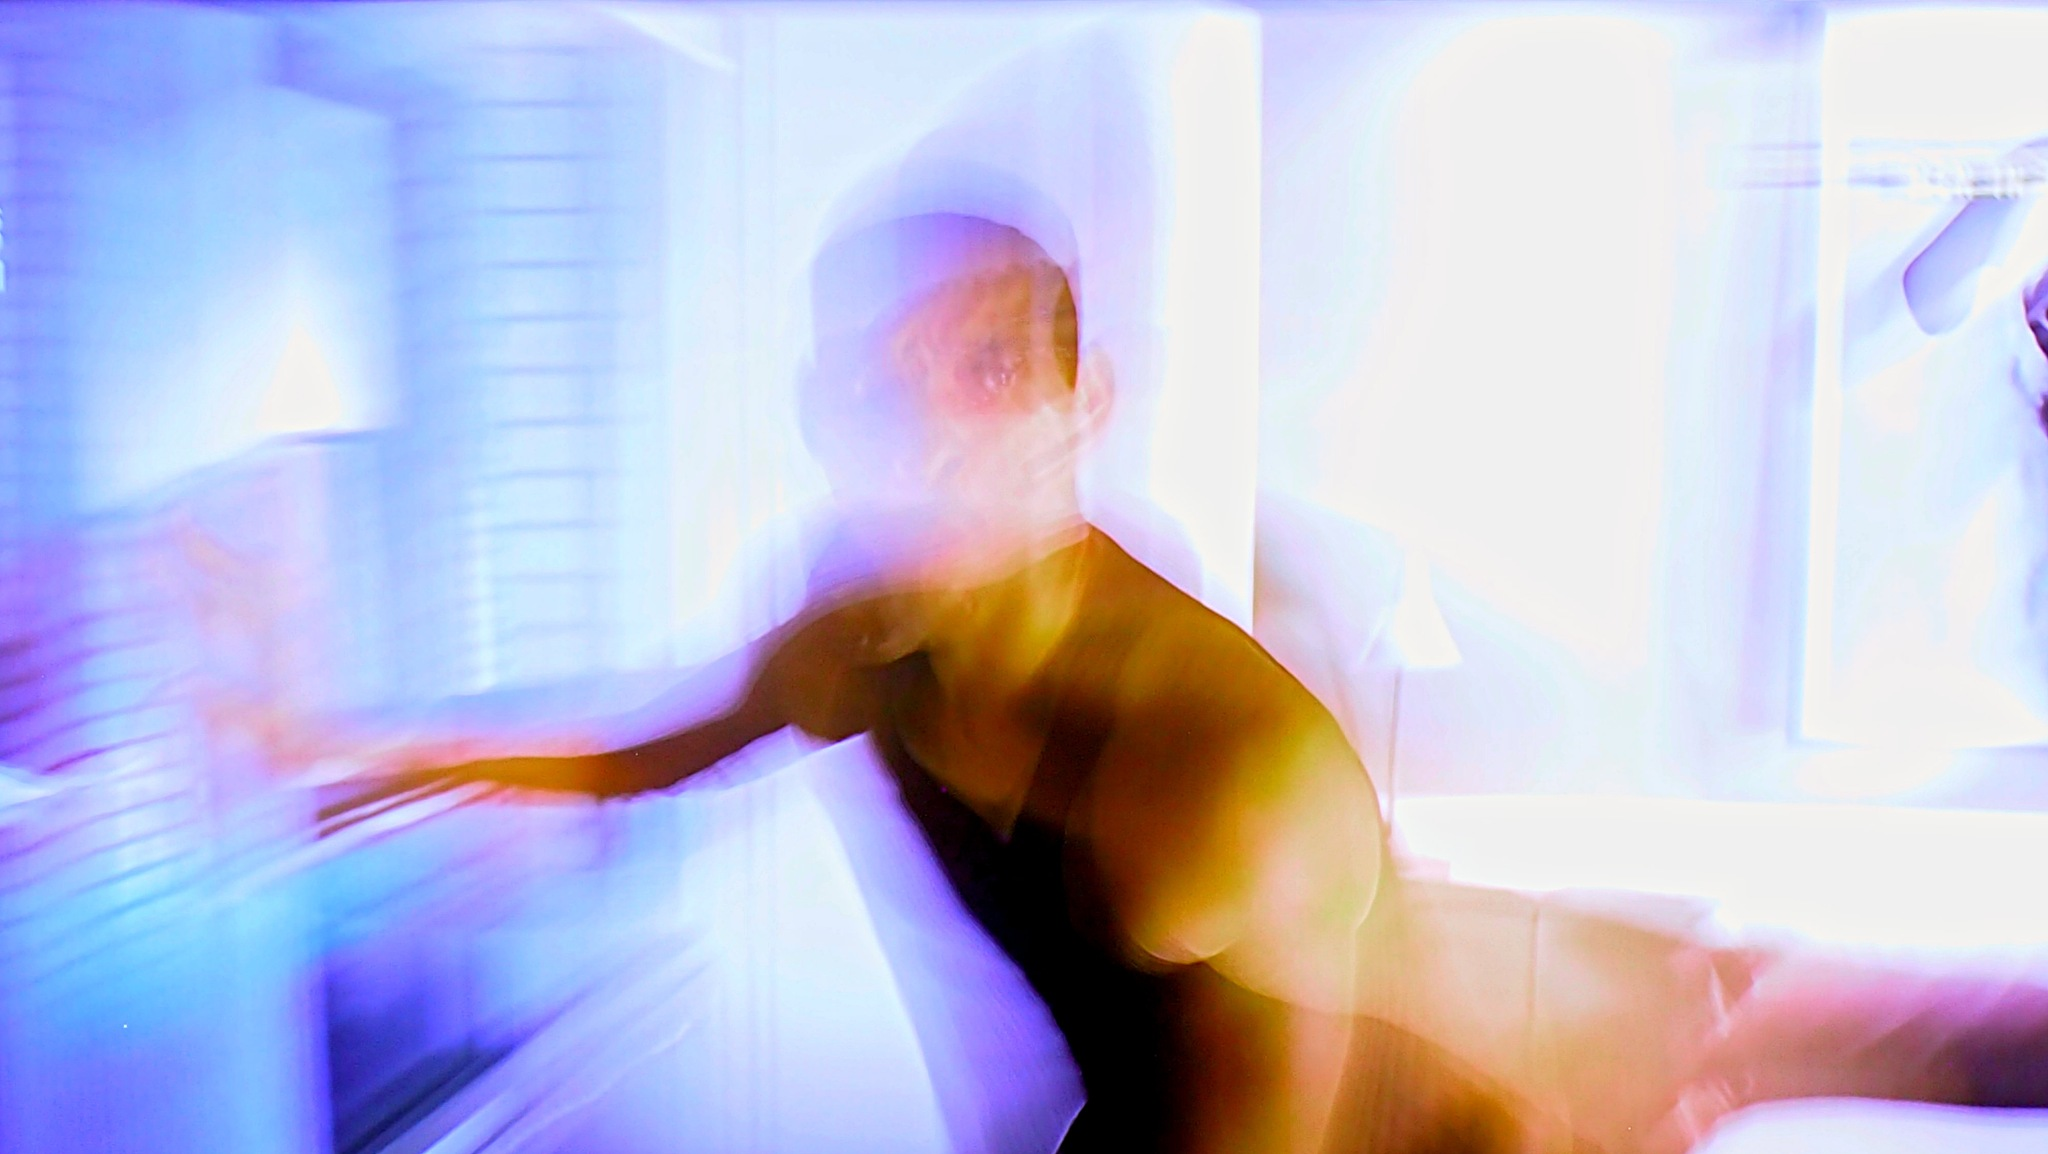 Watching Will Smith by Rudy Tarrazona Guacena